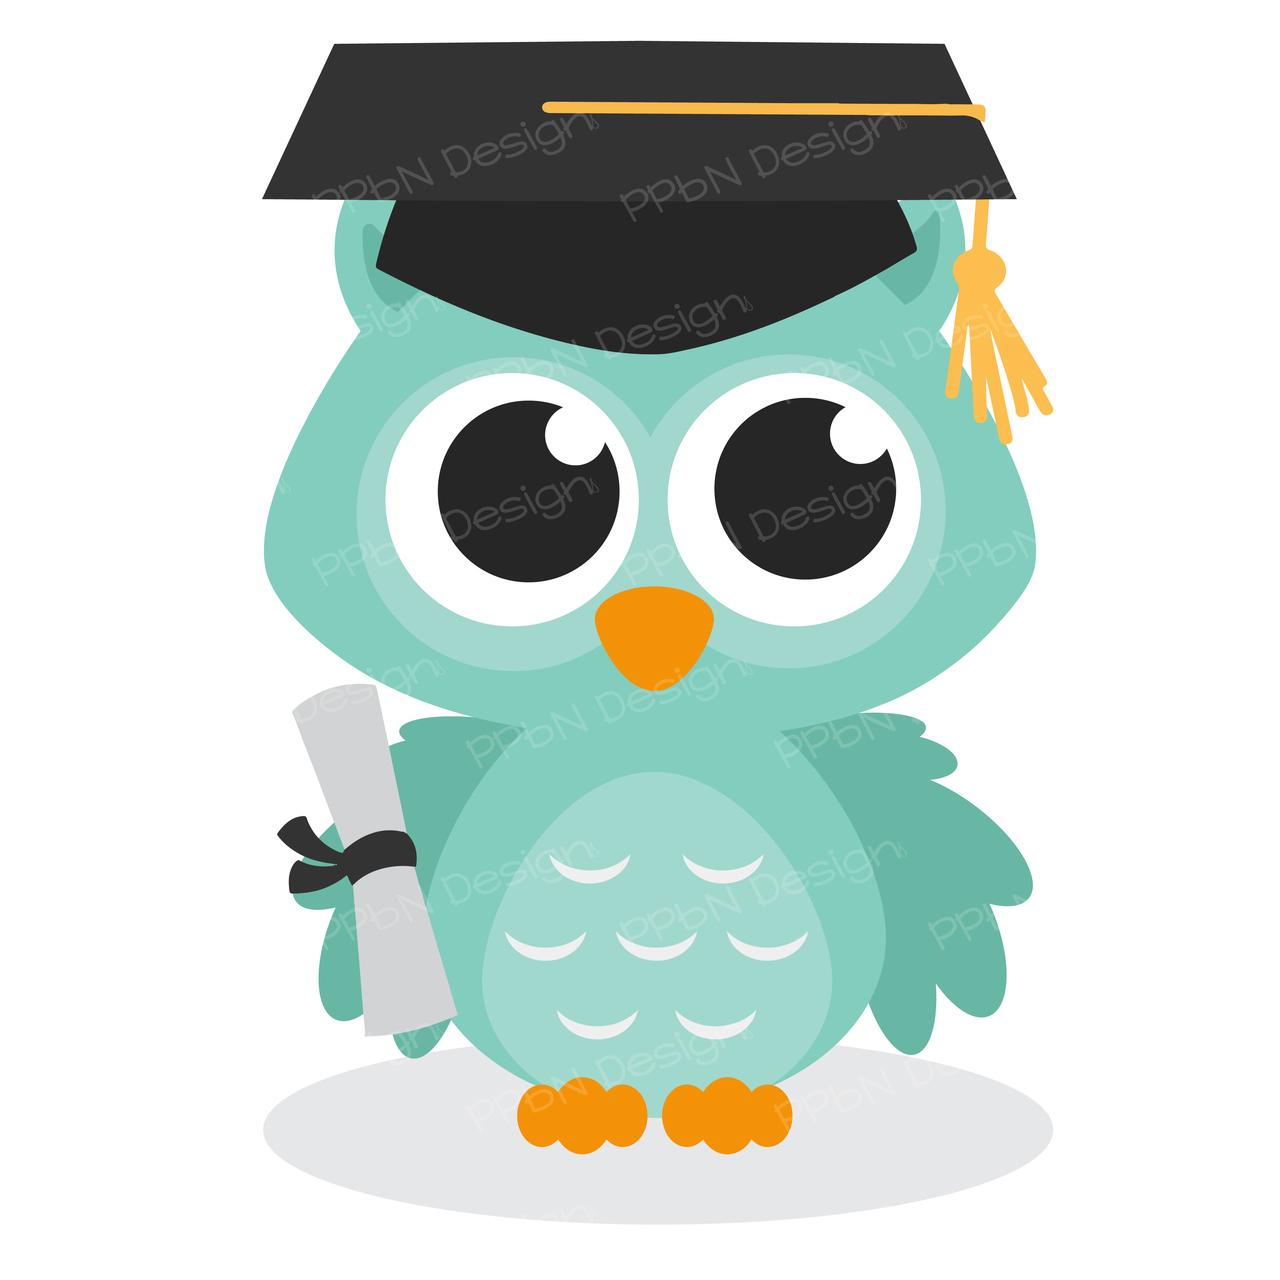 Graduation clipart owl 00 $0 Owl  ppbndesigns